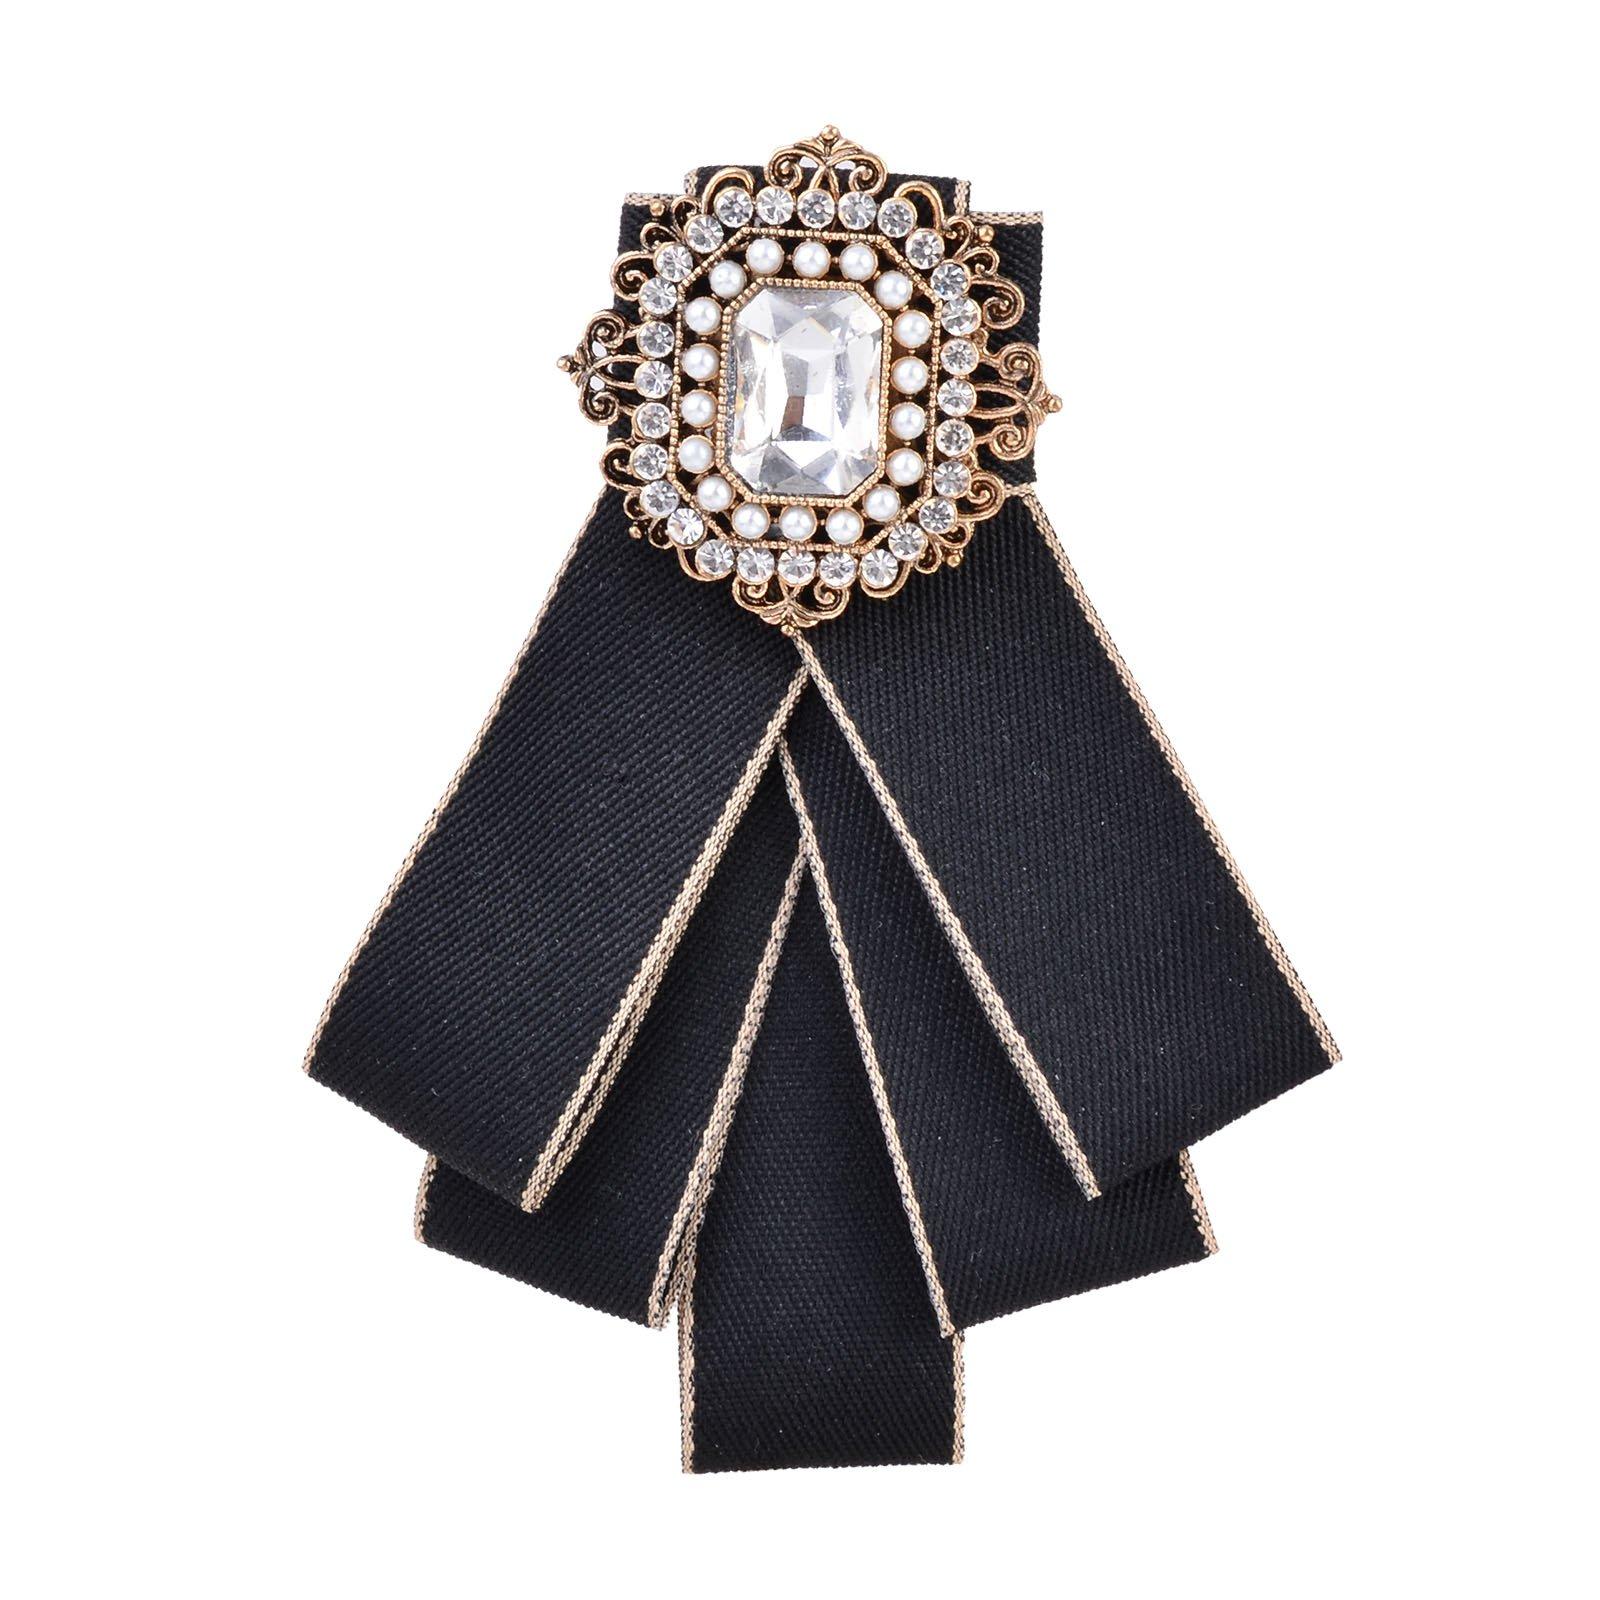 OBONNIE Neck Bow Tie Pin Brooch Classic Bowknot Necktie Jabot Collar Neck Tie Cravat Suit Accessory (Black)